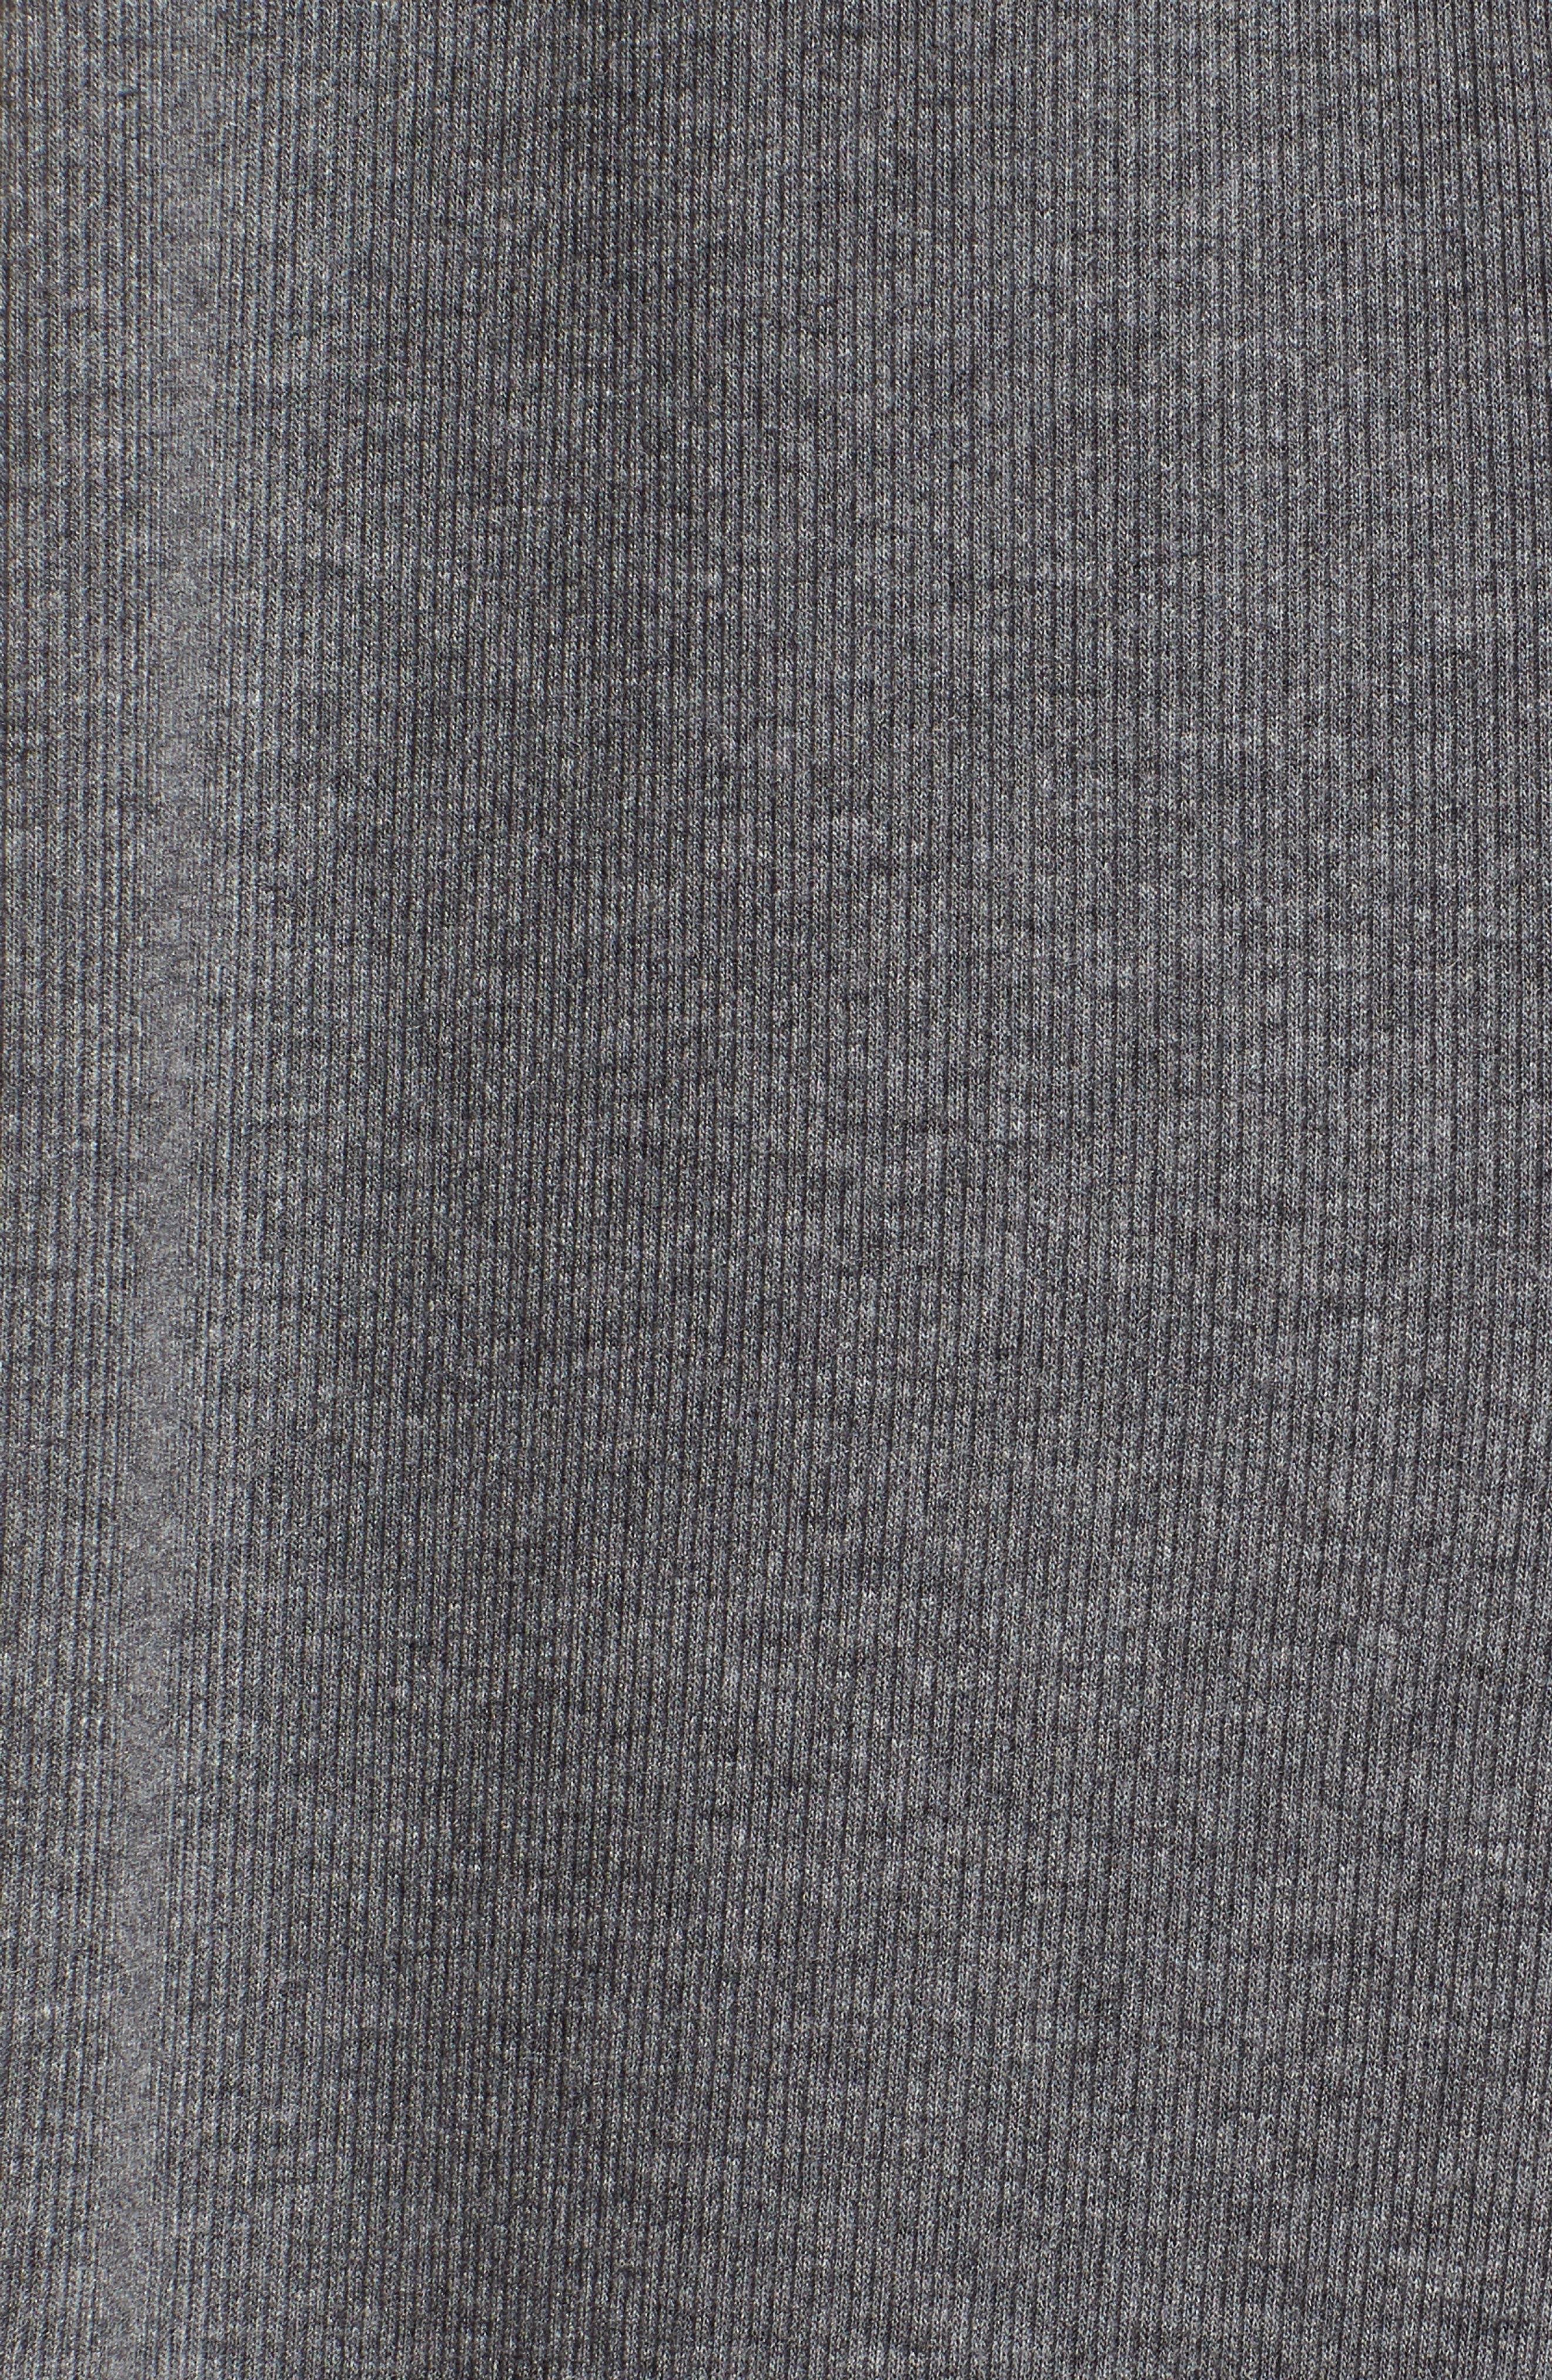 Rib Knit Leggings,                             Alternate thumbnail 7, color,                             GREY CLOUDY HEATHER